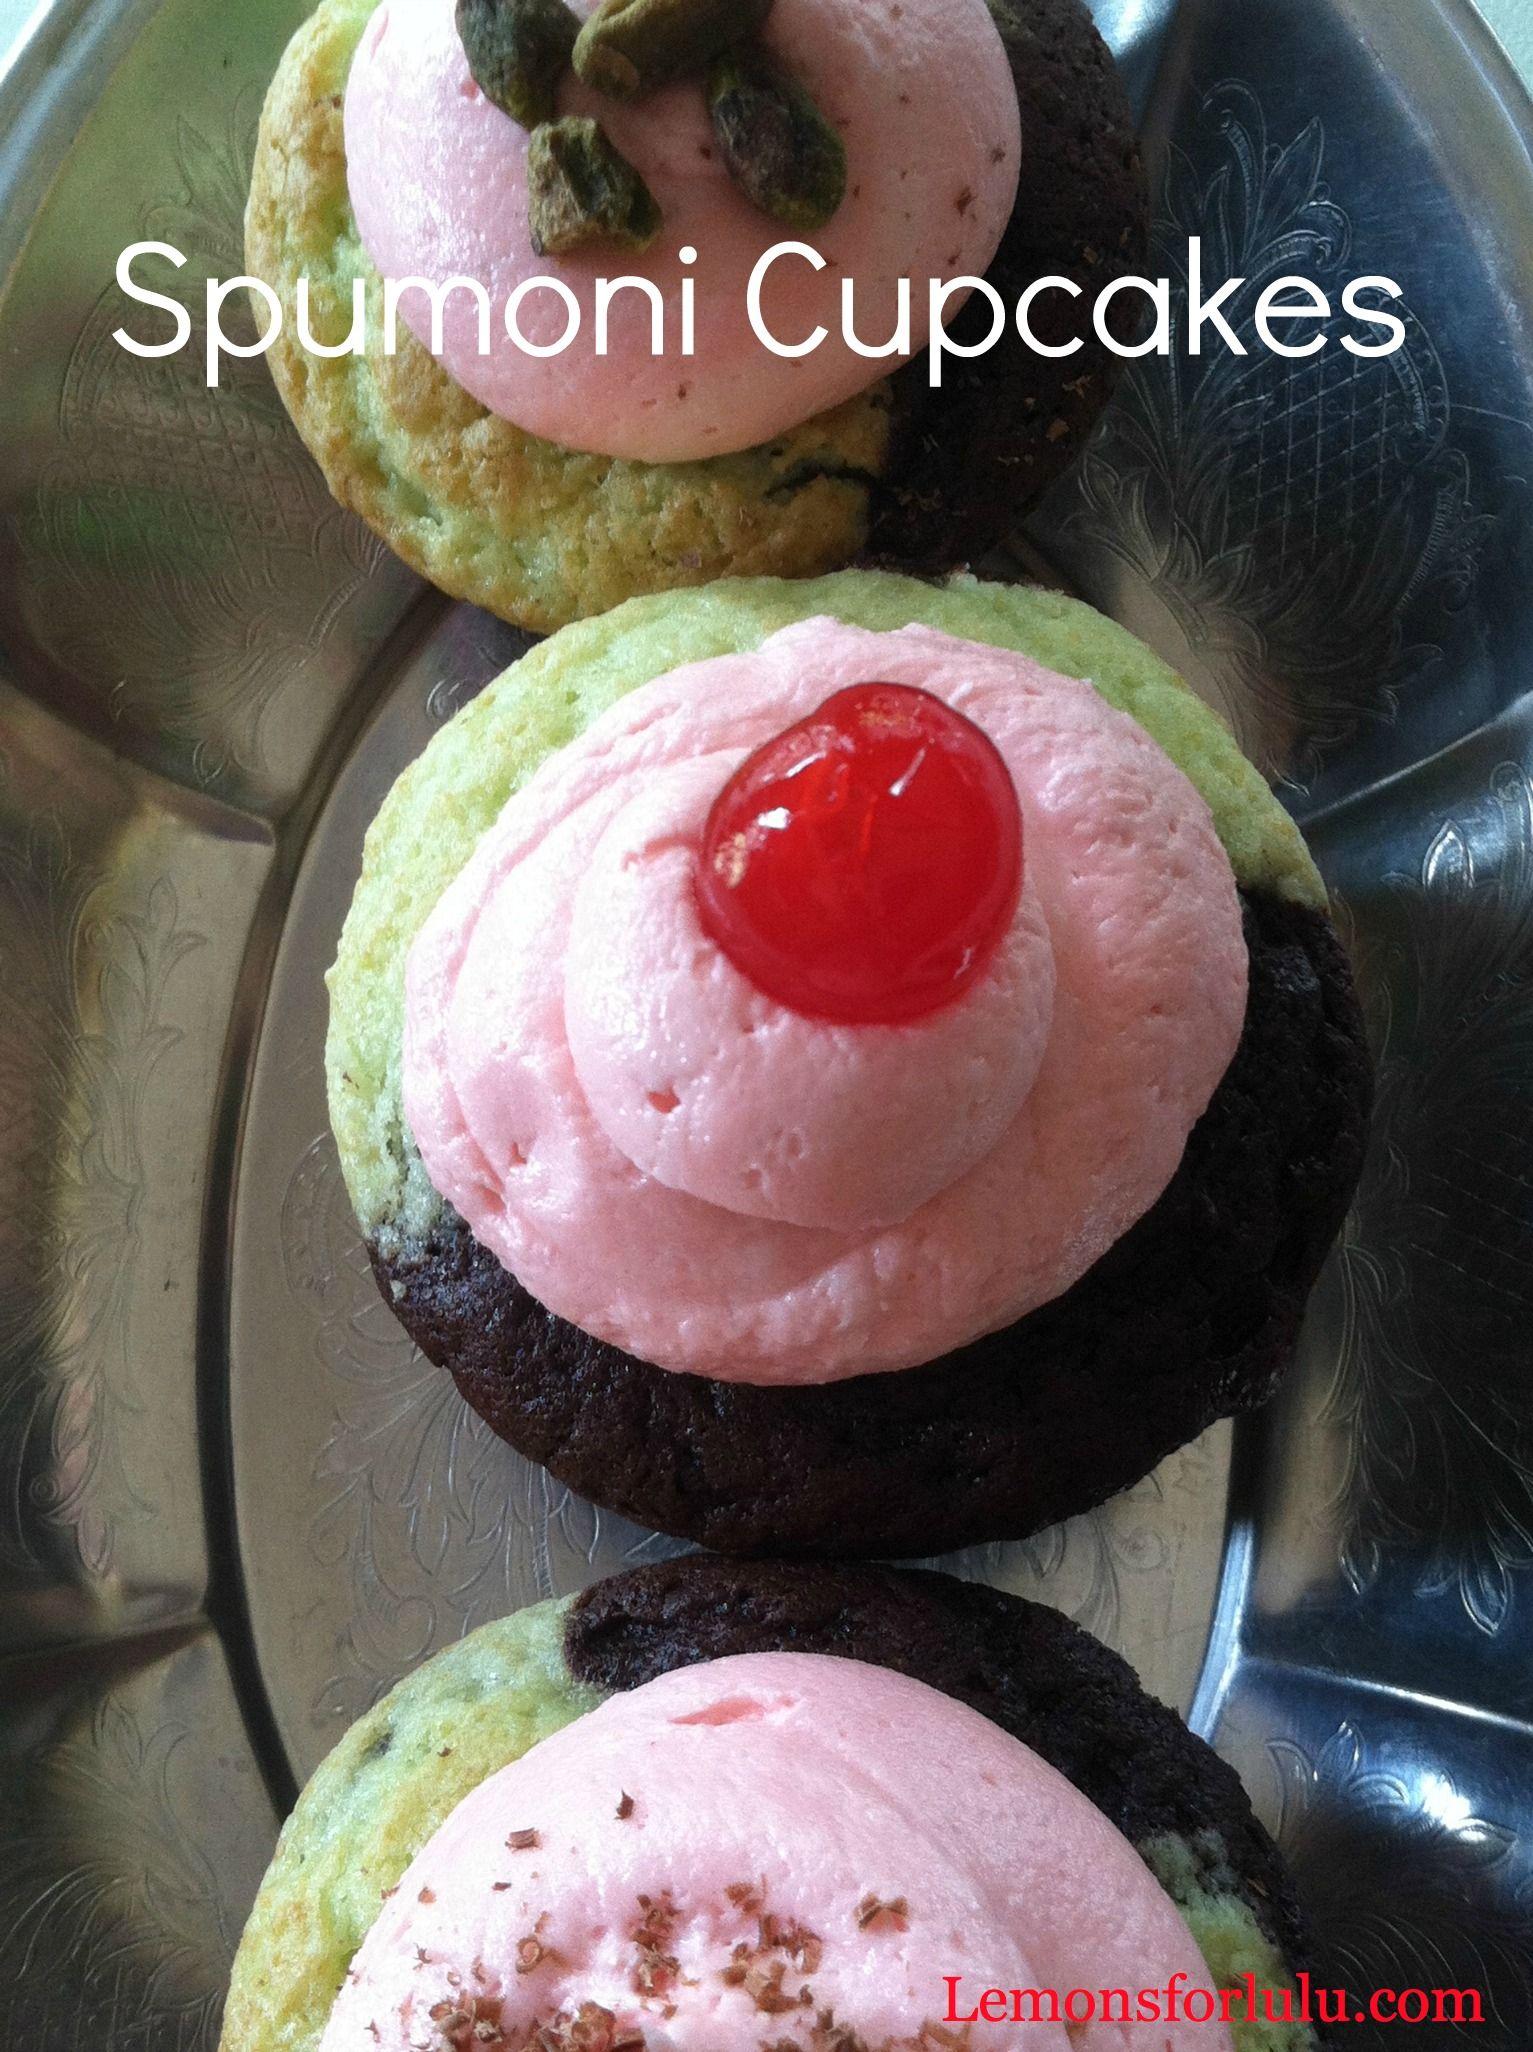 Spumoni Cupcakes! Love spumoni - these should be delicious!